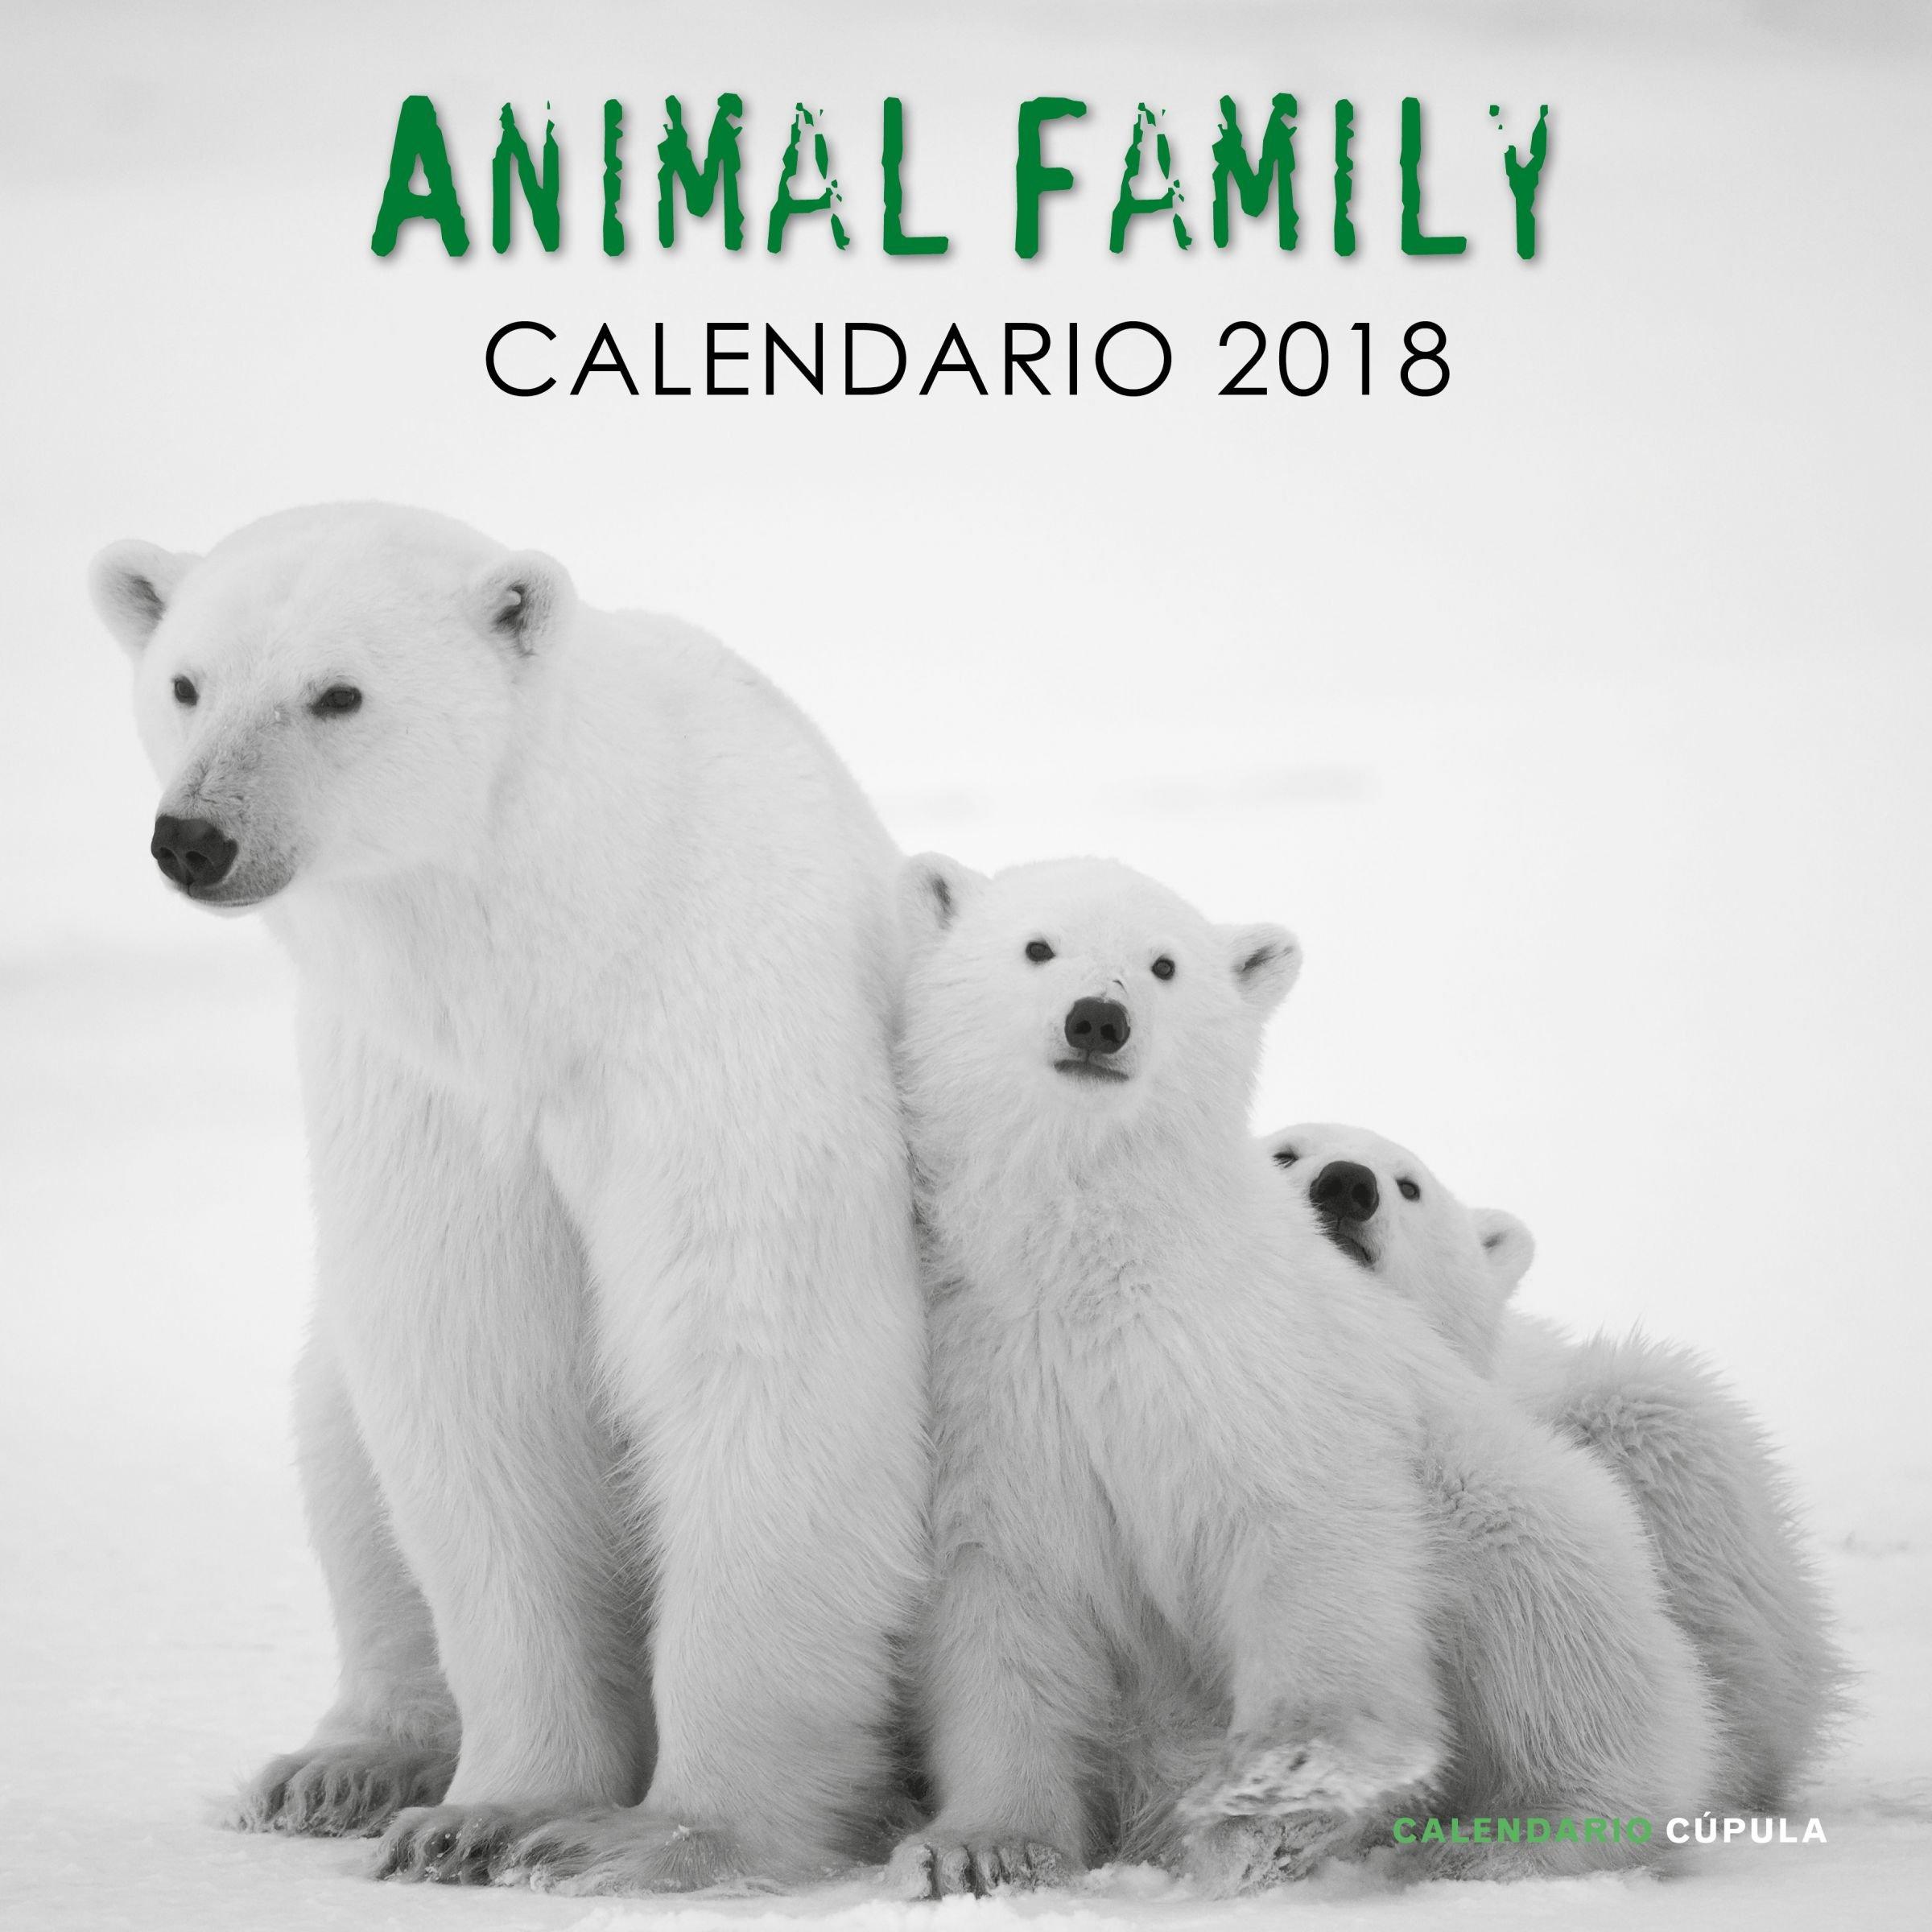 Calendario Animal Family 2018 (Calendarios y agendas): Amazon.es ...